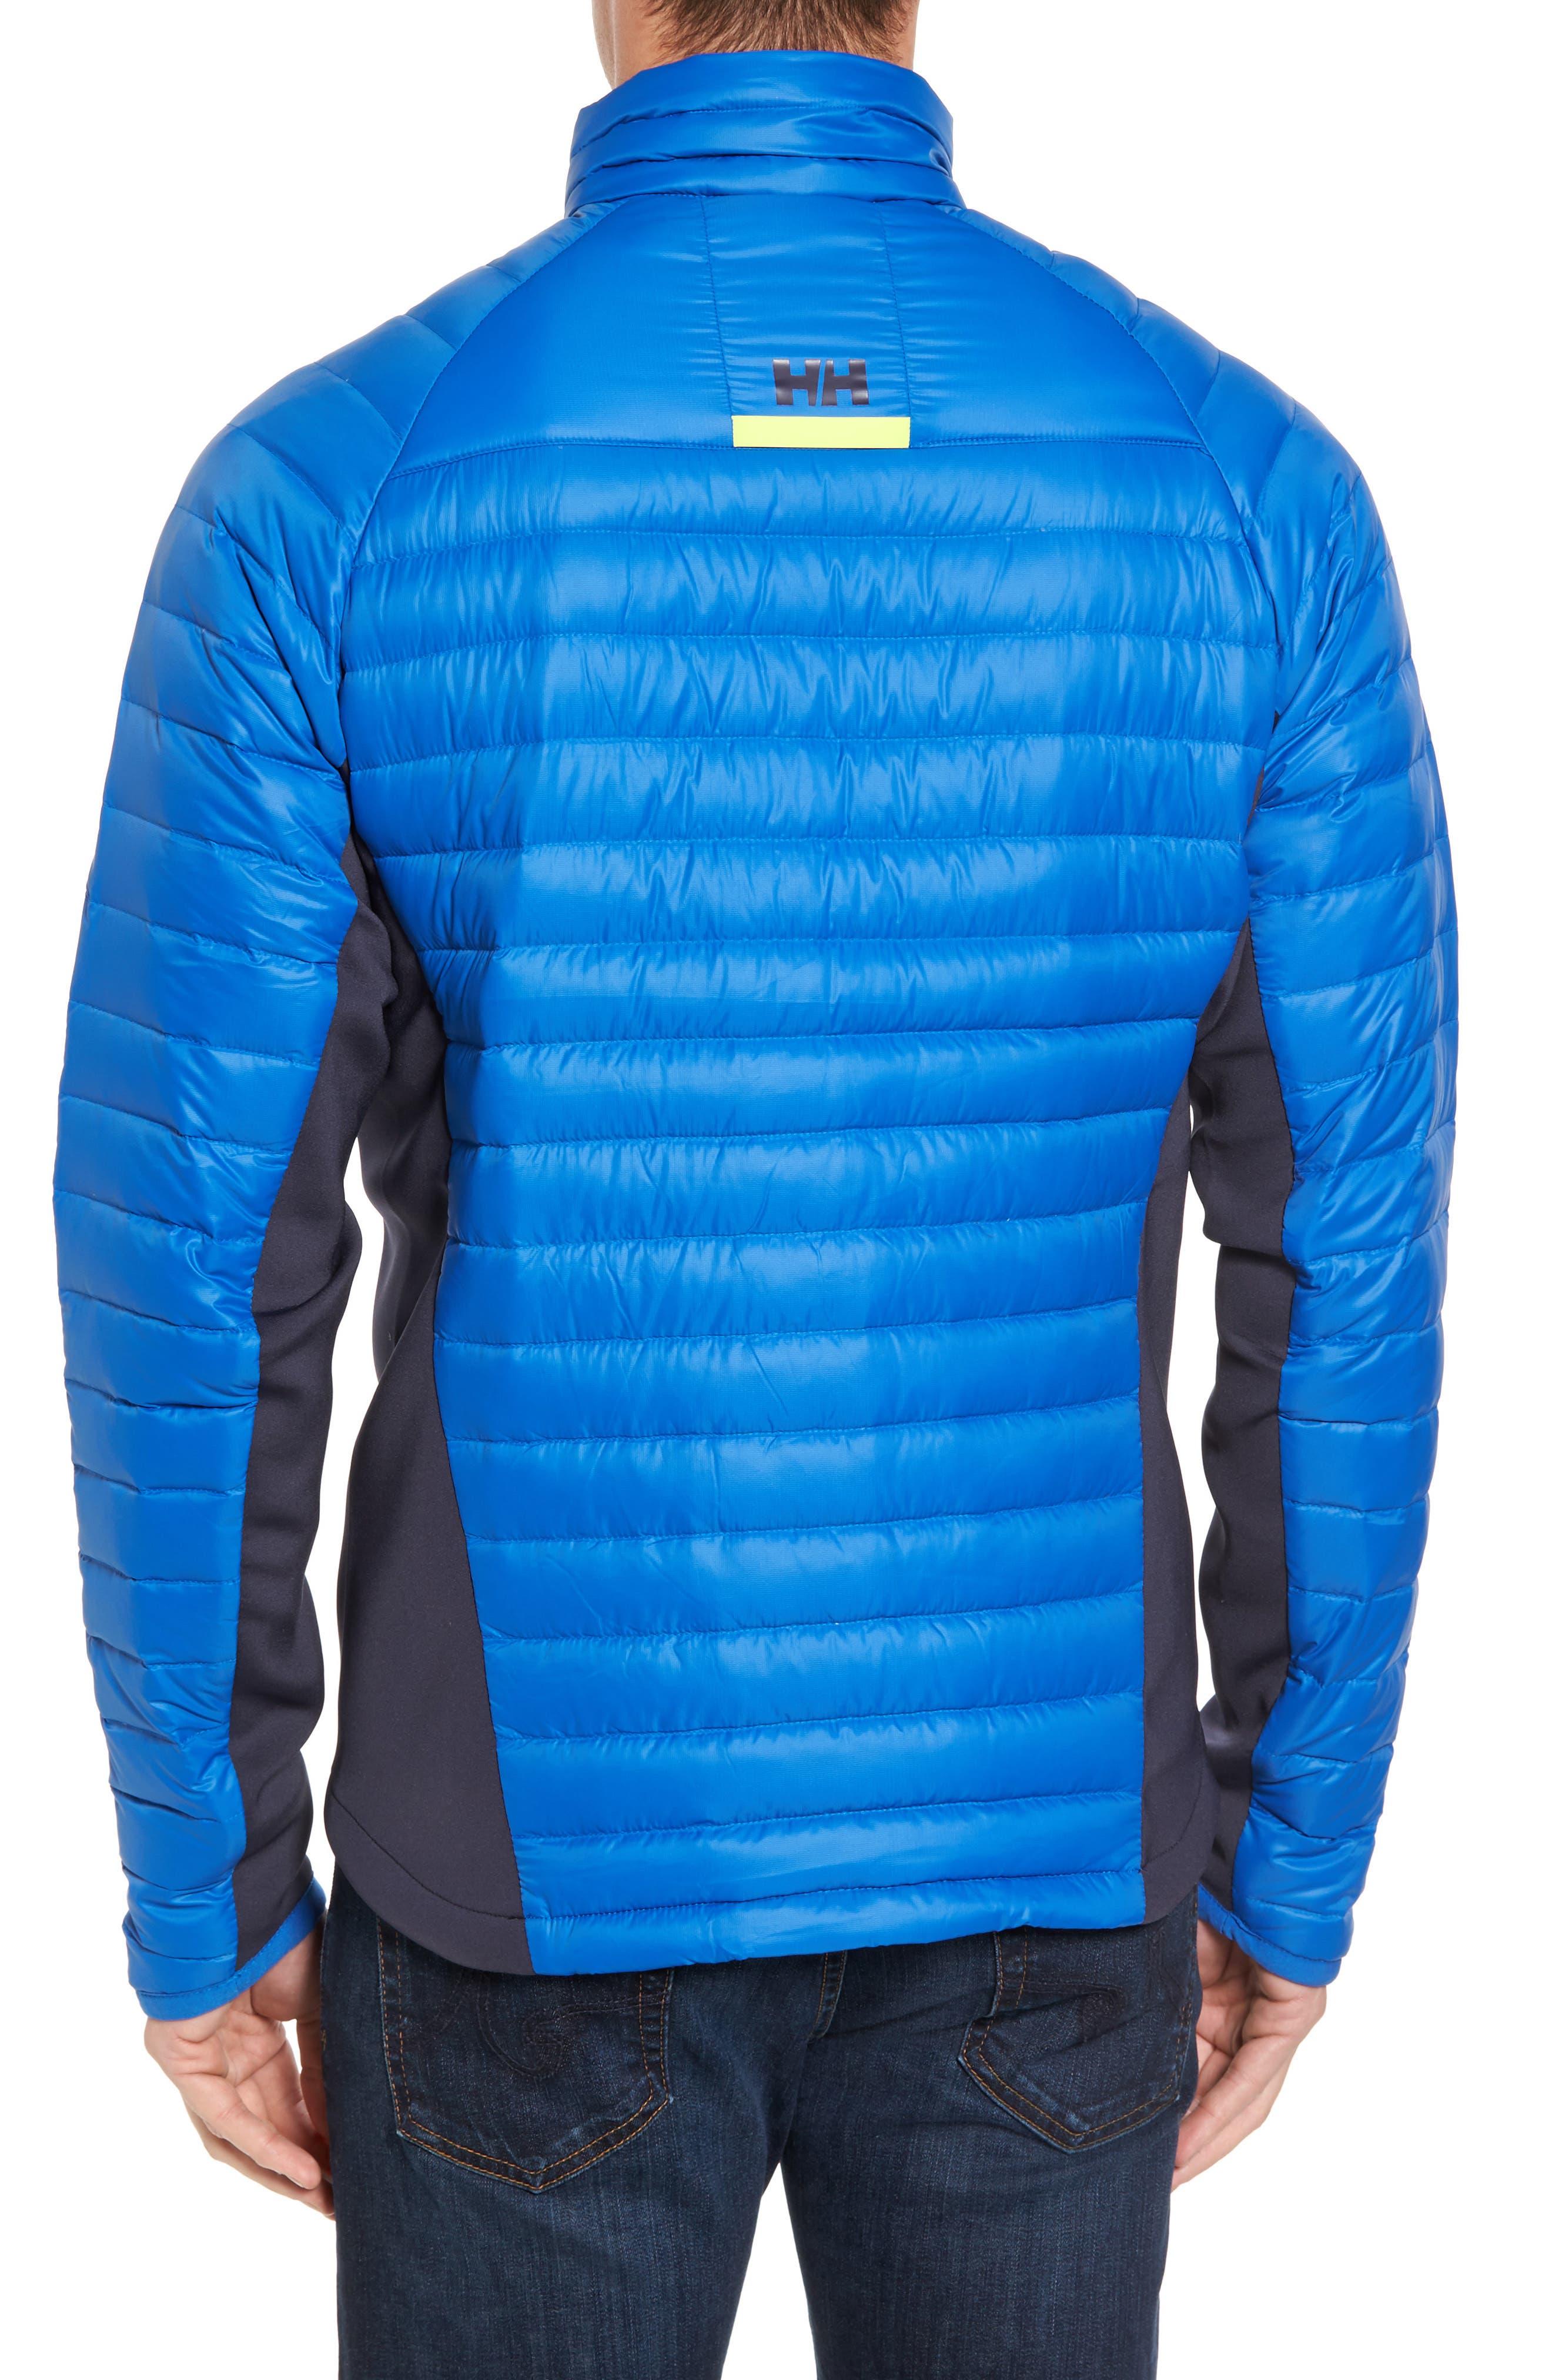 Verglas Insulator Hybrid Jacket,                             Alternate thumbnail 2, color,                             563 Olympian Blue